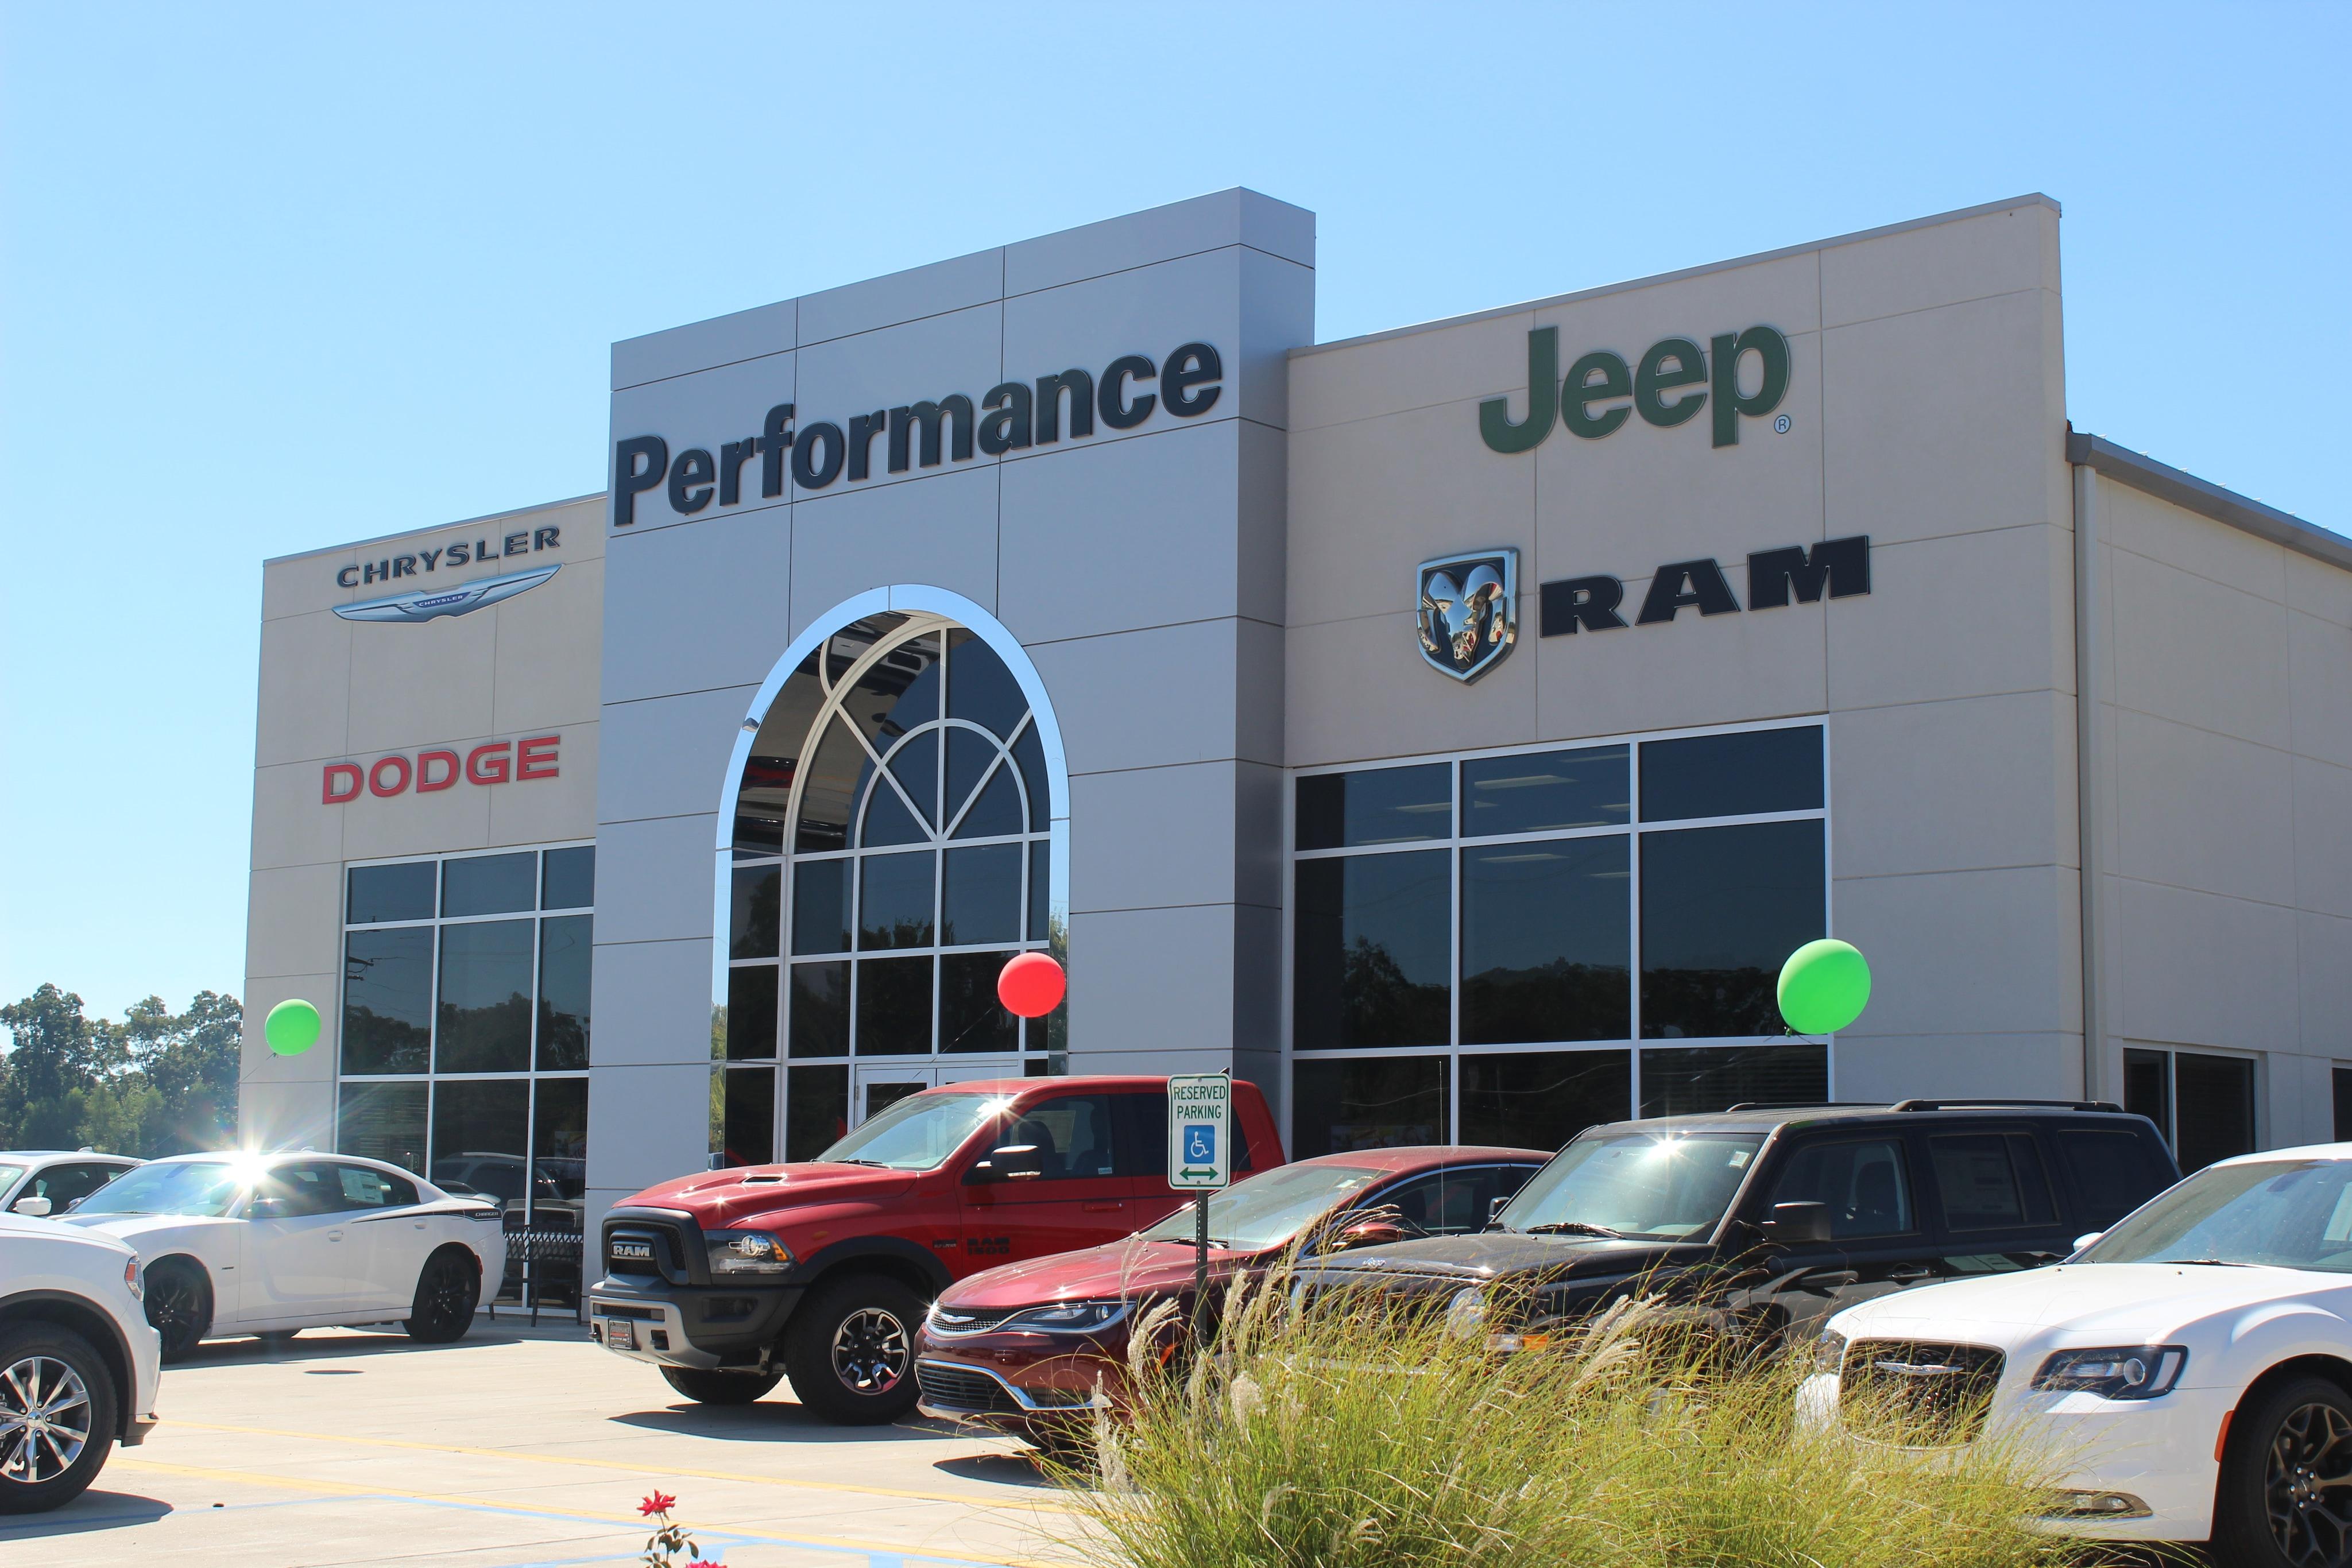 2019 Dodge Journey For Sale in Ferriday LA | Performance Dodge